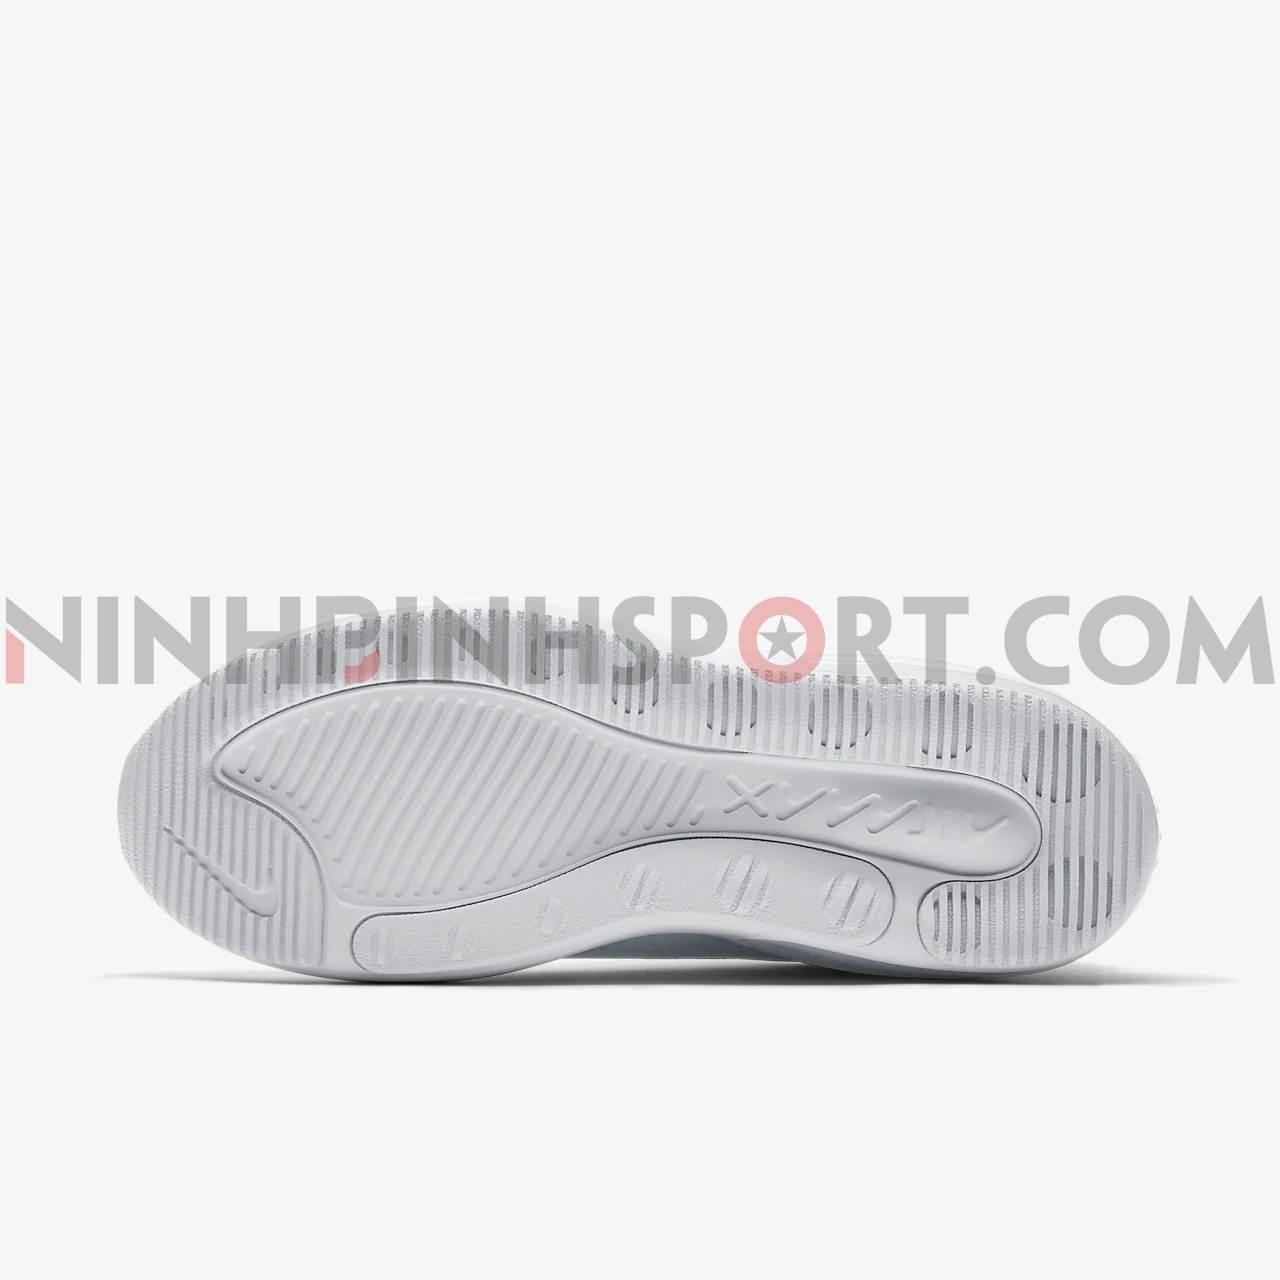 Giầy thể thao nữ Nike Air Max Dia Shoe AQ4312-105